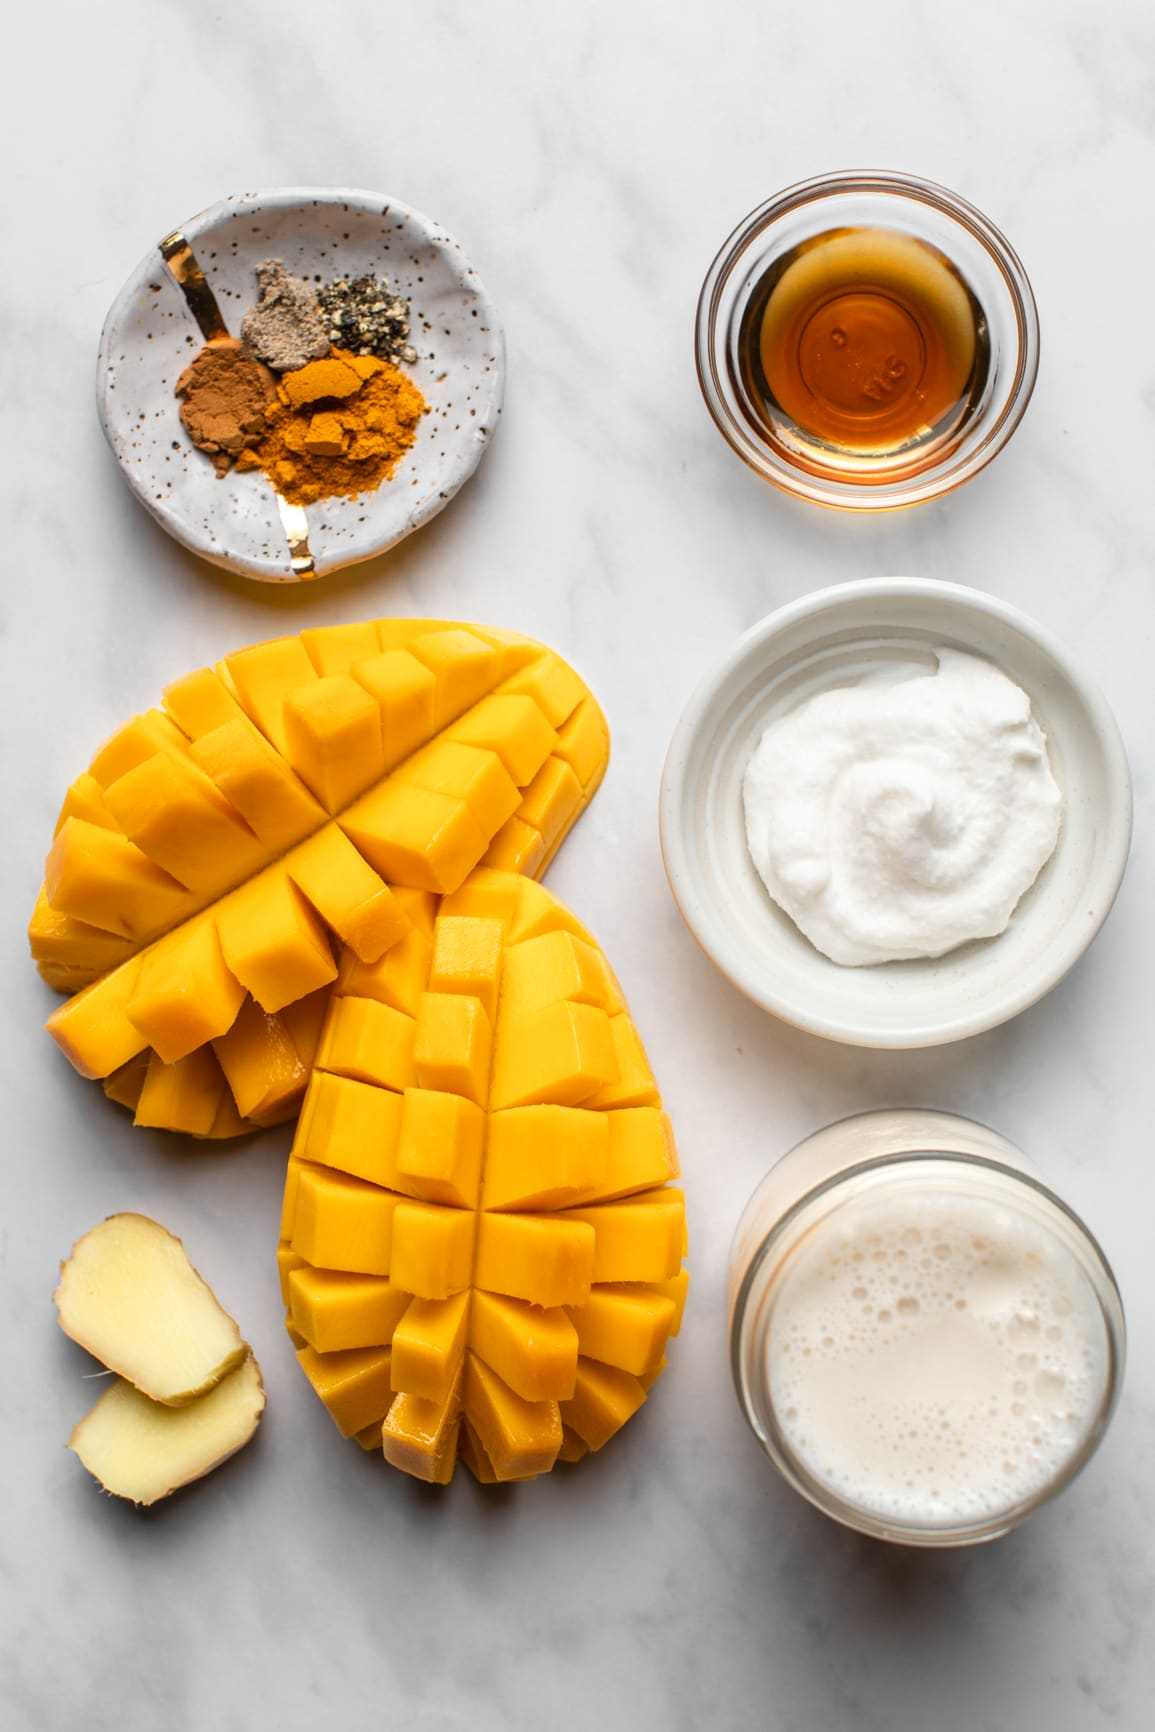 ingredients for golden milk mango smoothie organized on marble background